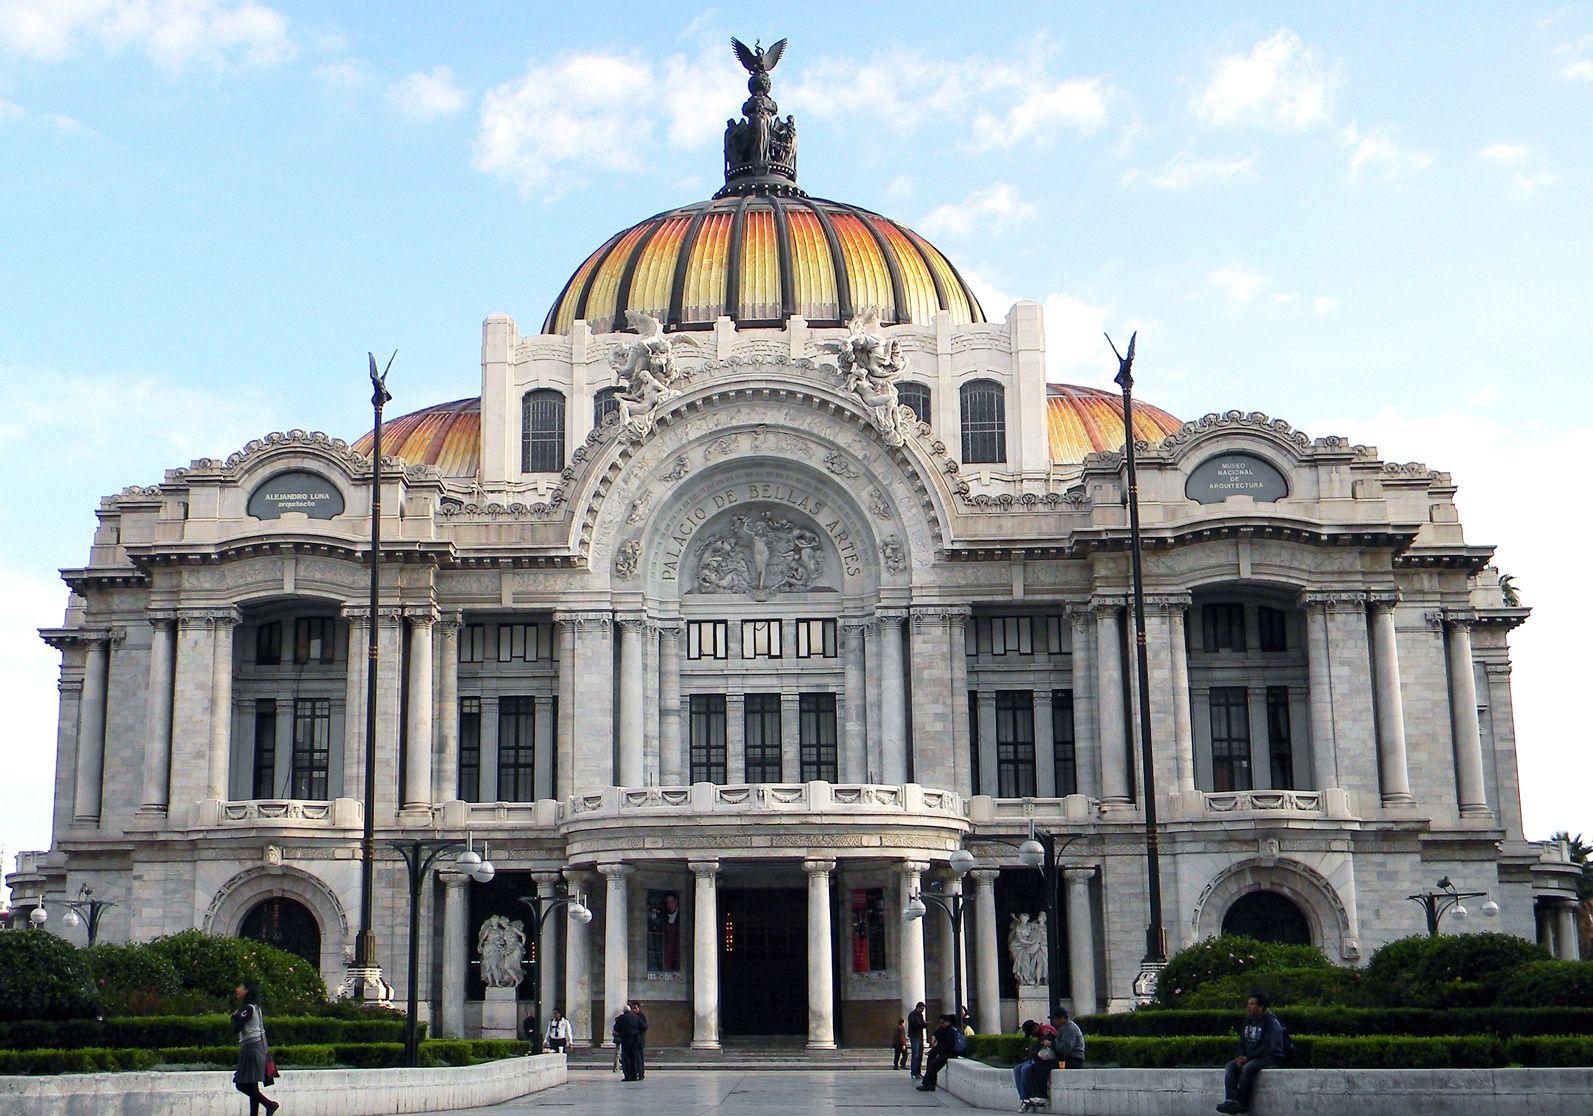 Central de arquitectura a mexico city based design studio has - Palacio De Bellas Artes Cultura Mexicana Mexico Citymexico